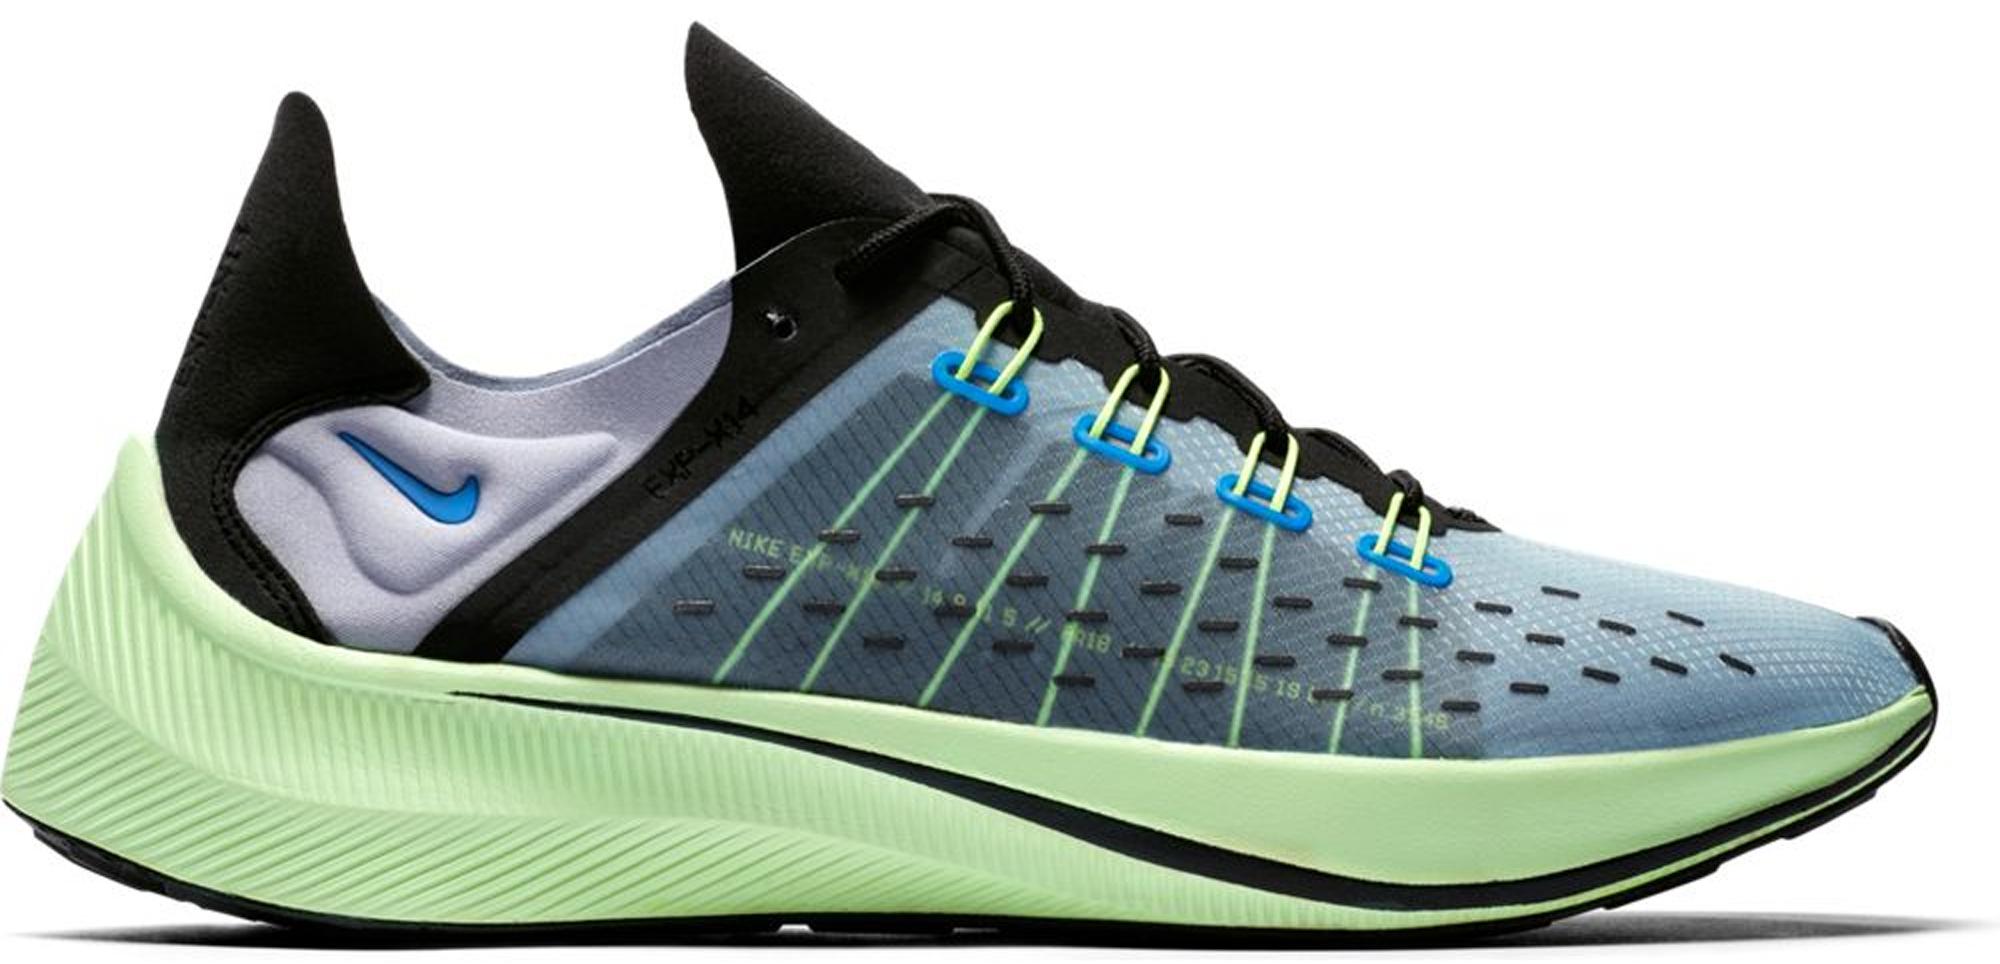 Nike Exp X-14 Photo Blue Volt - AO1554-400